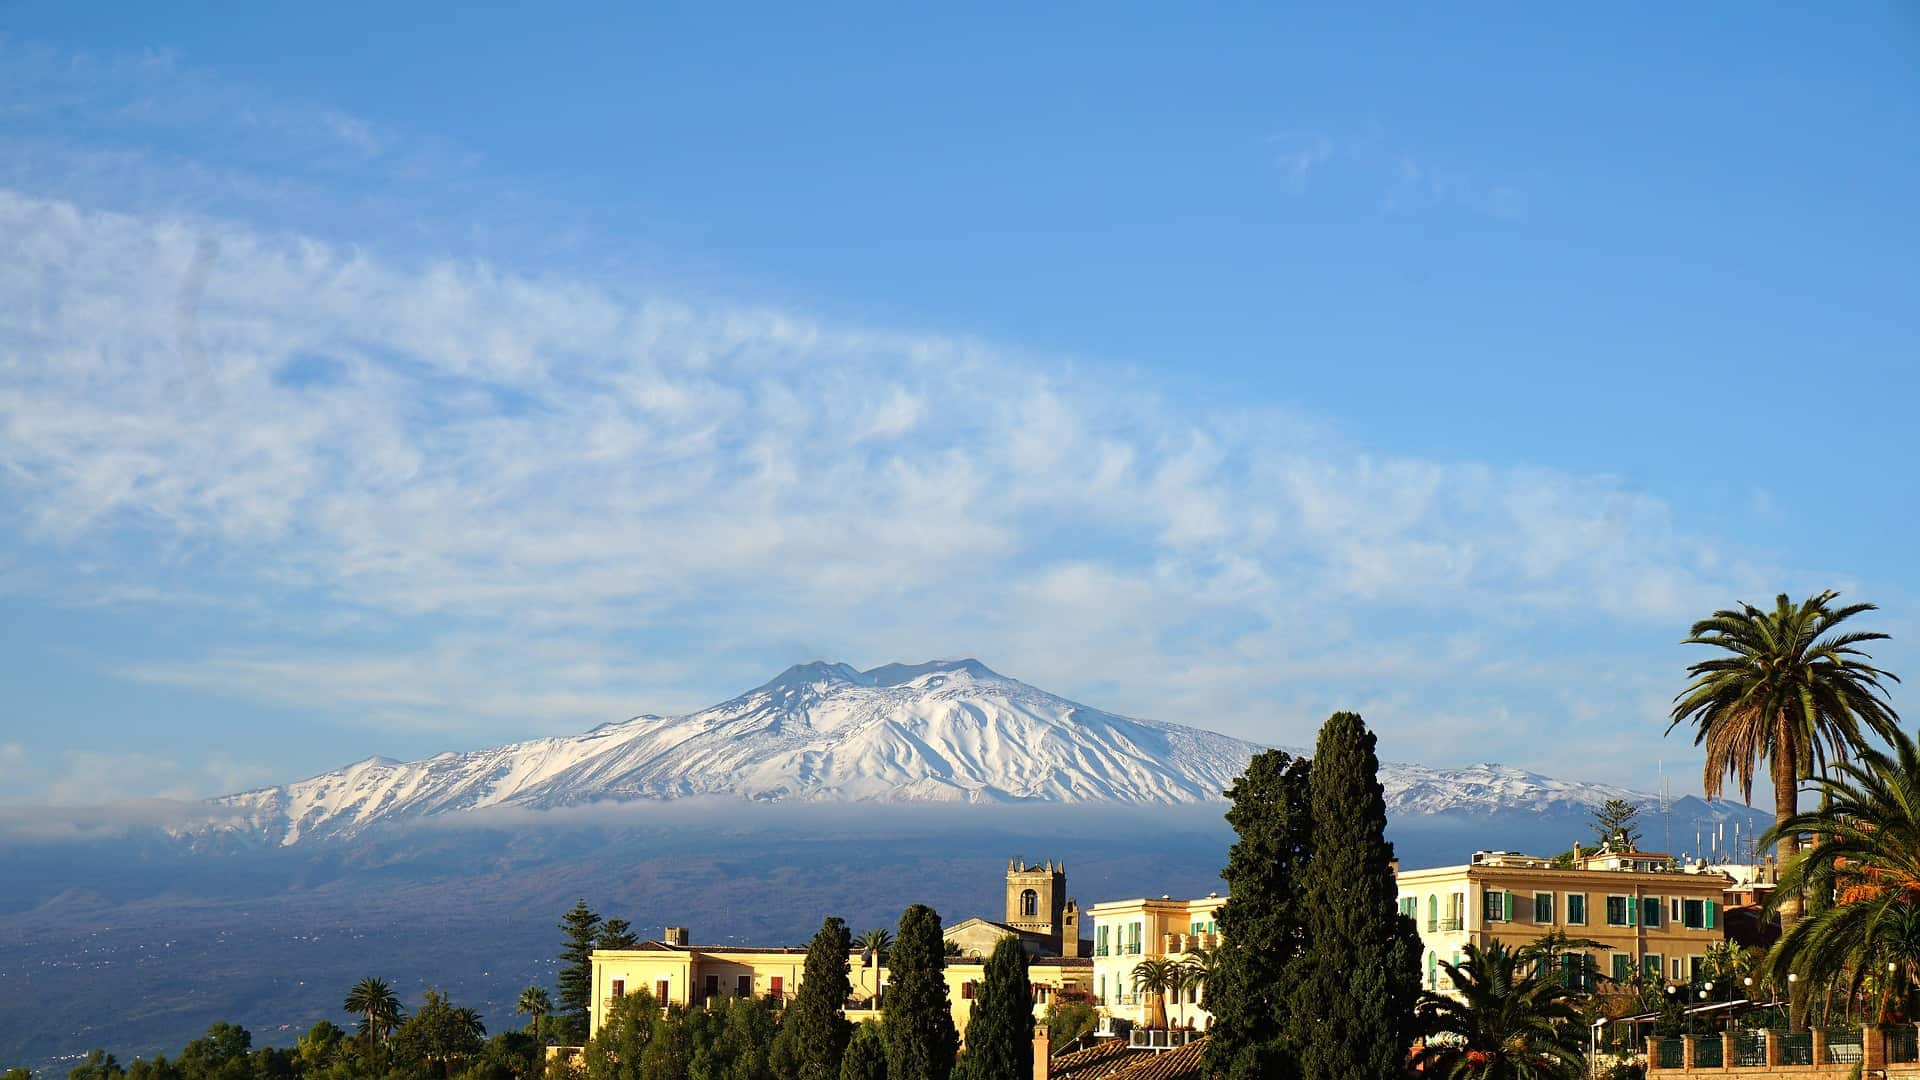 Italy - Sicily - Mount Etna